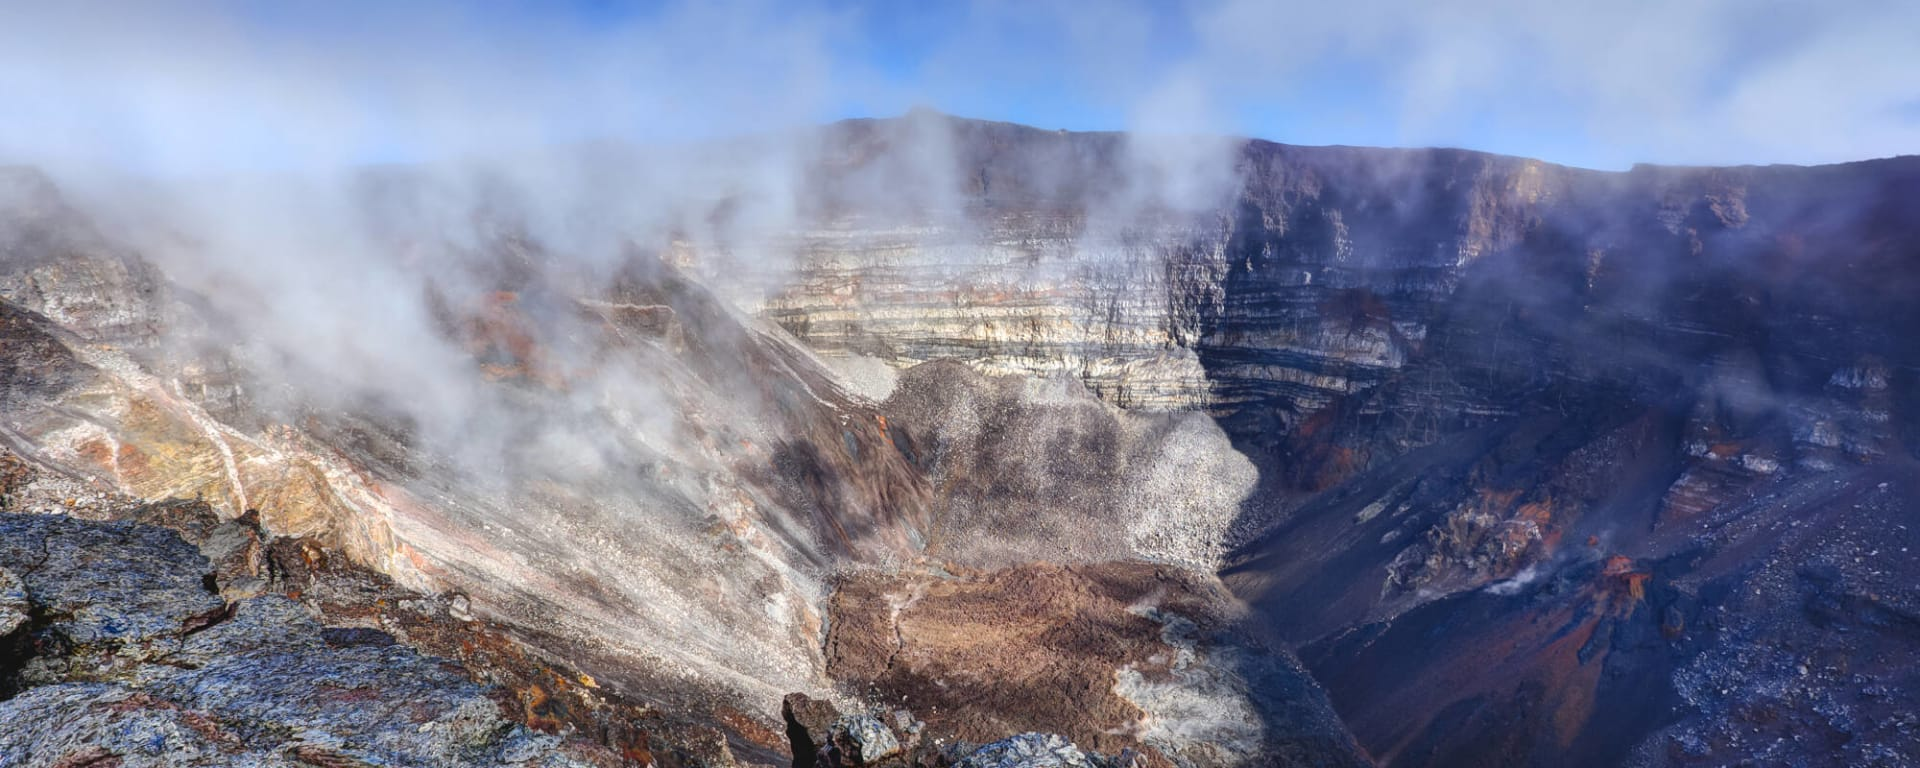 Vulkan & Wilder Süden, EN, Ganztägig in Zentral La Réunion: Réunion Vulkan